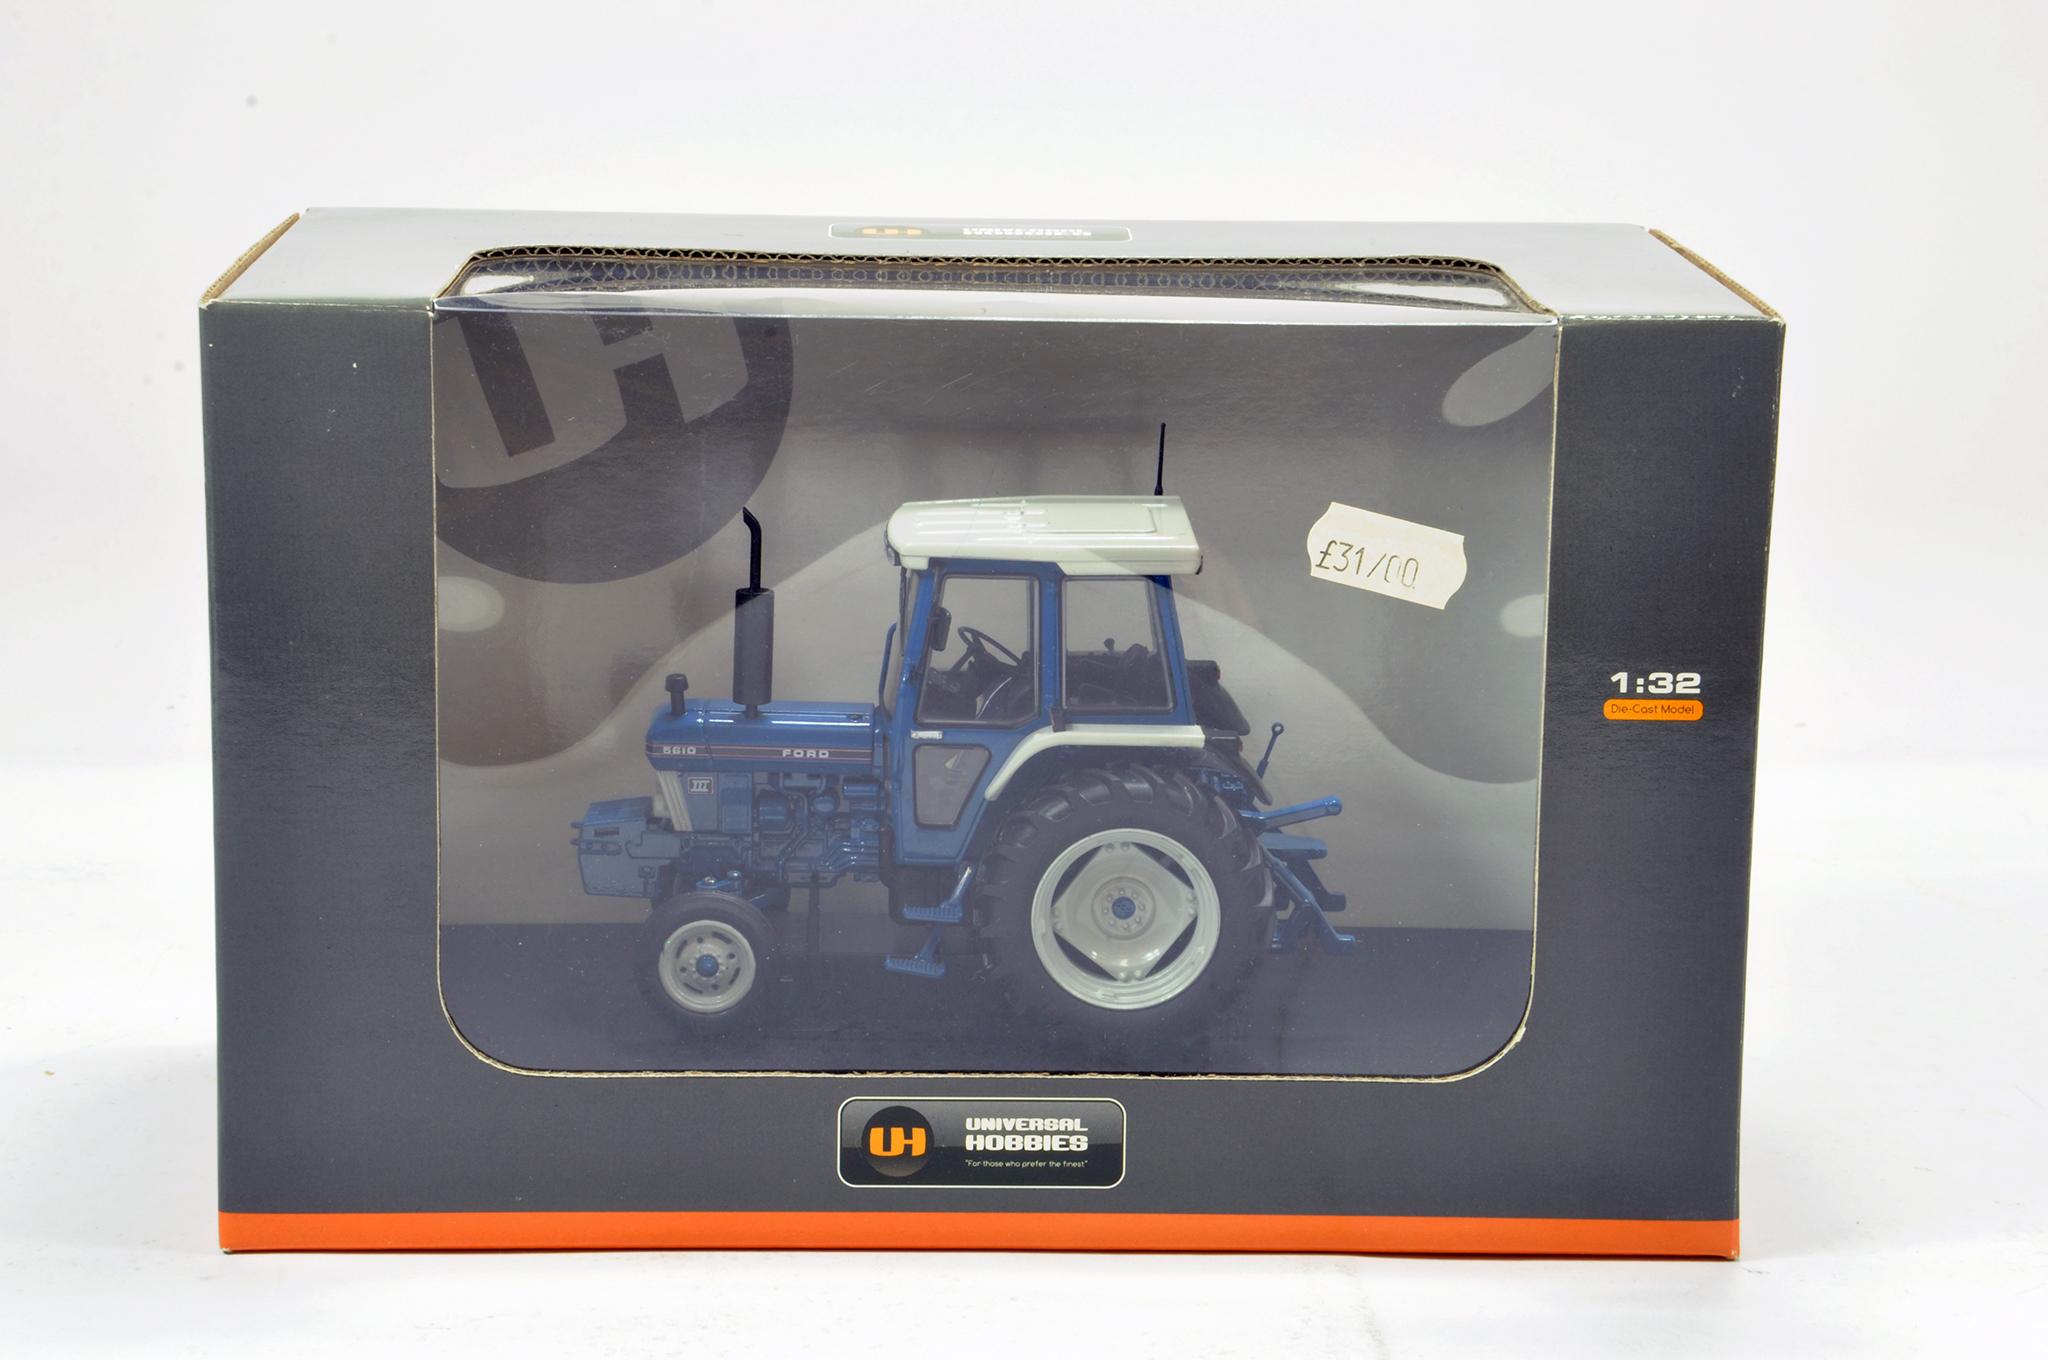 Lot 159 - Universal hobbies 1/32 Ford 5610 GEN III 2WD Tractor. Generally excellent in box.